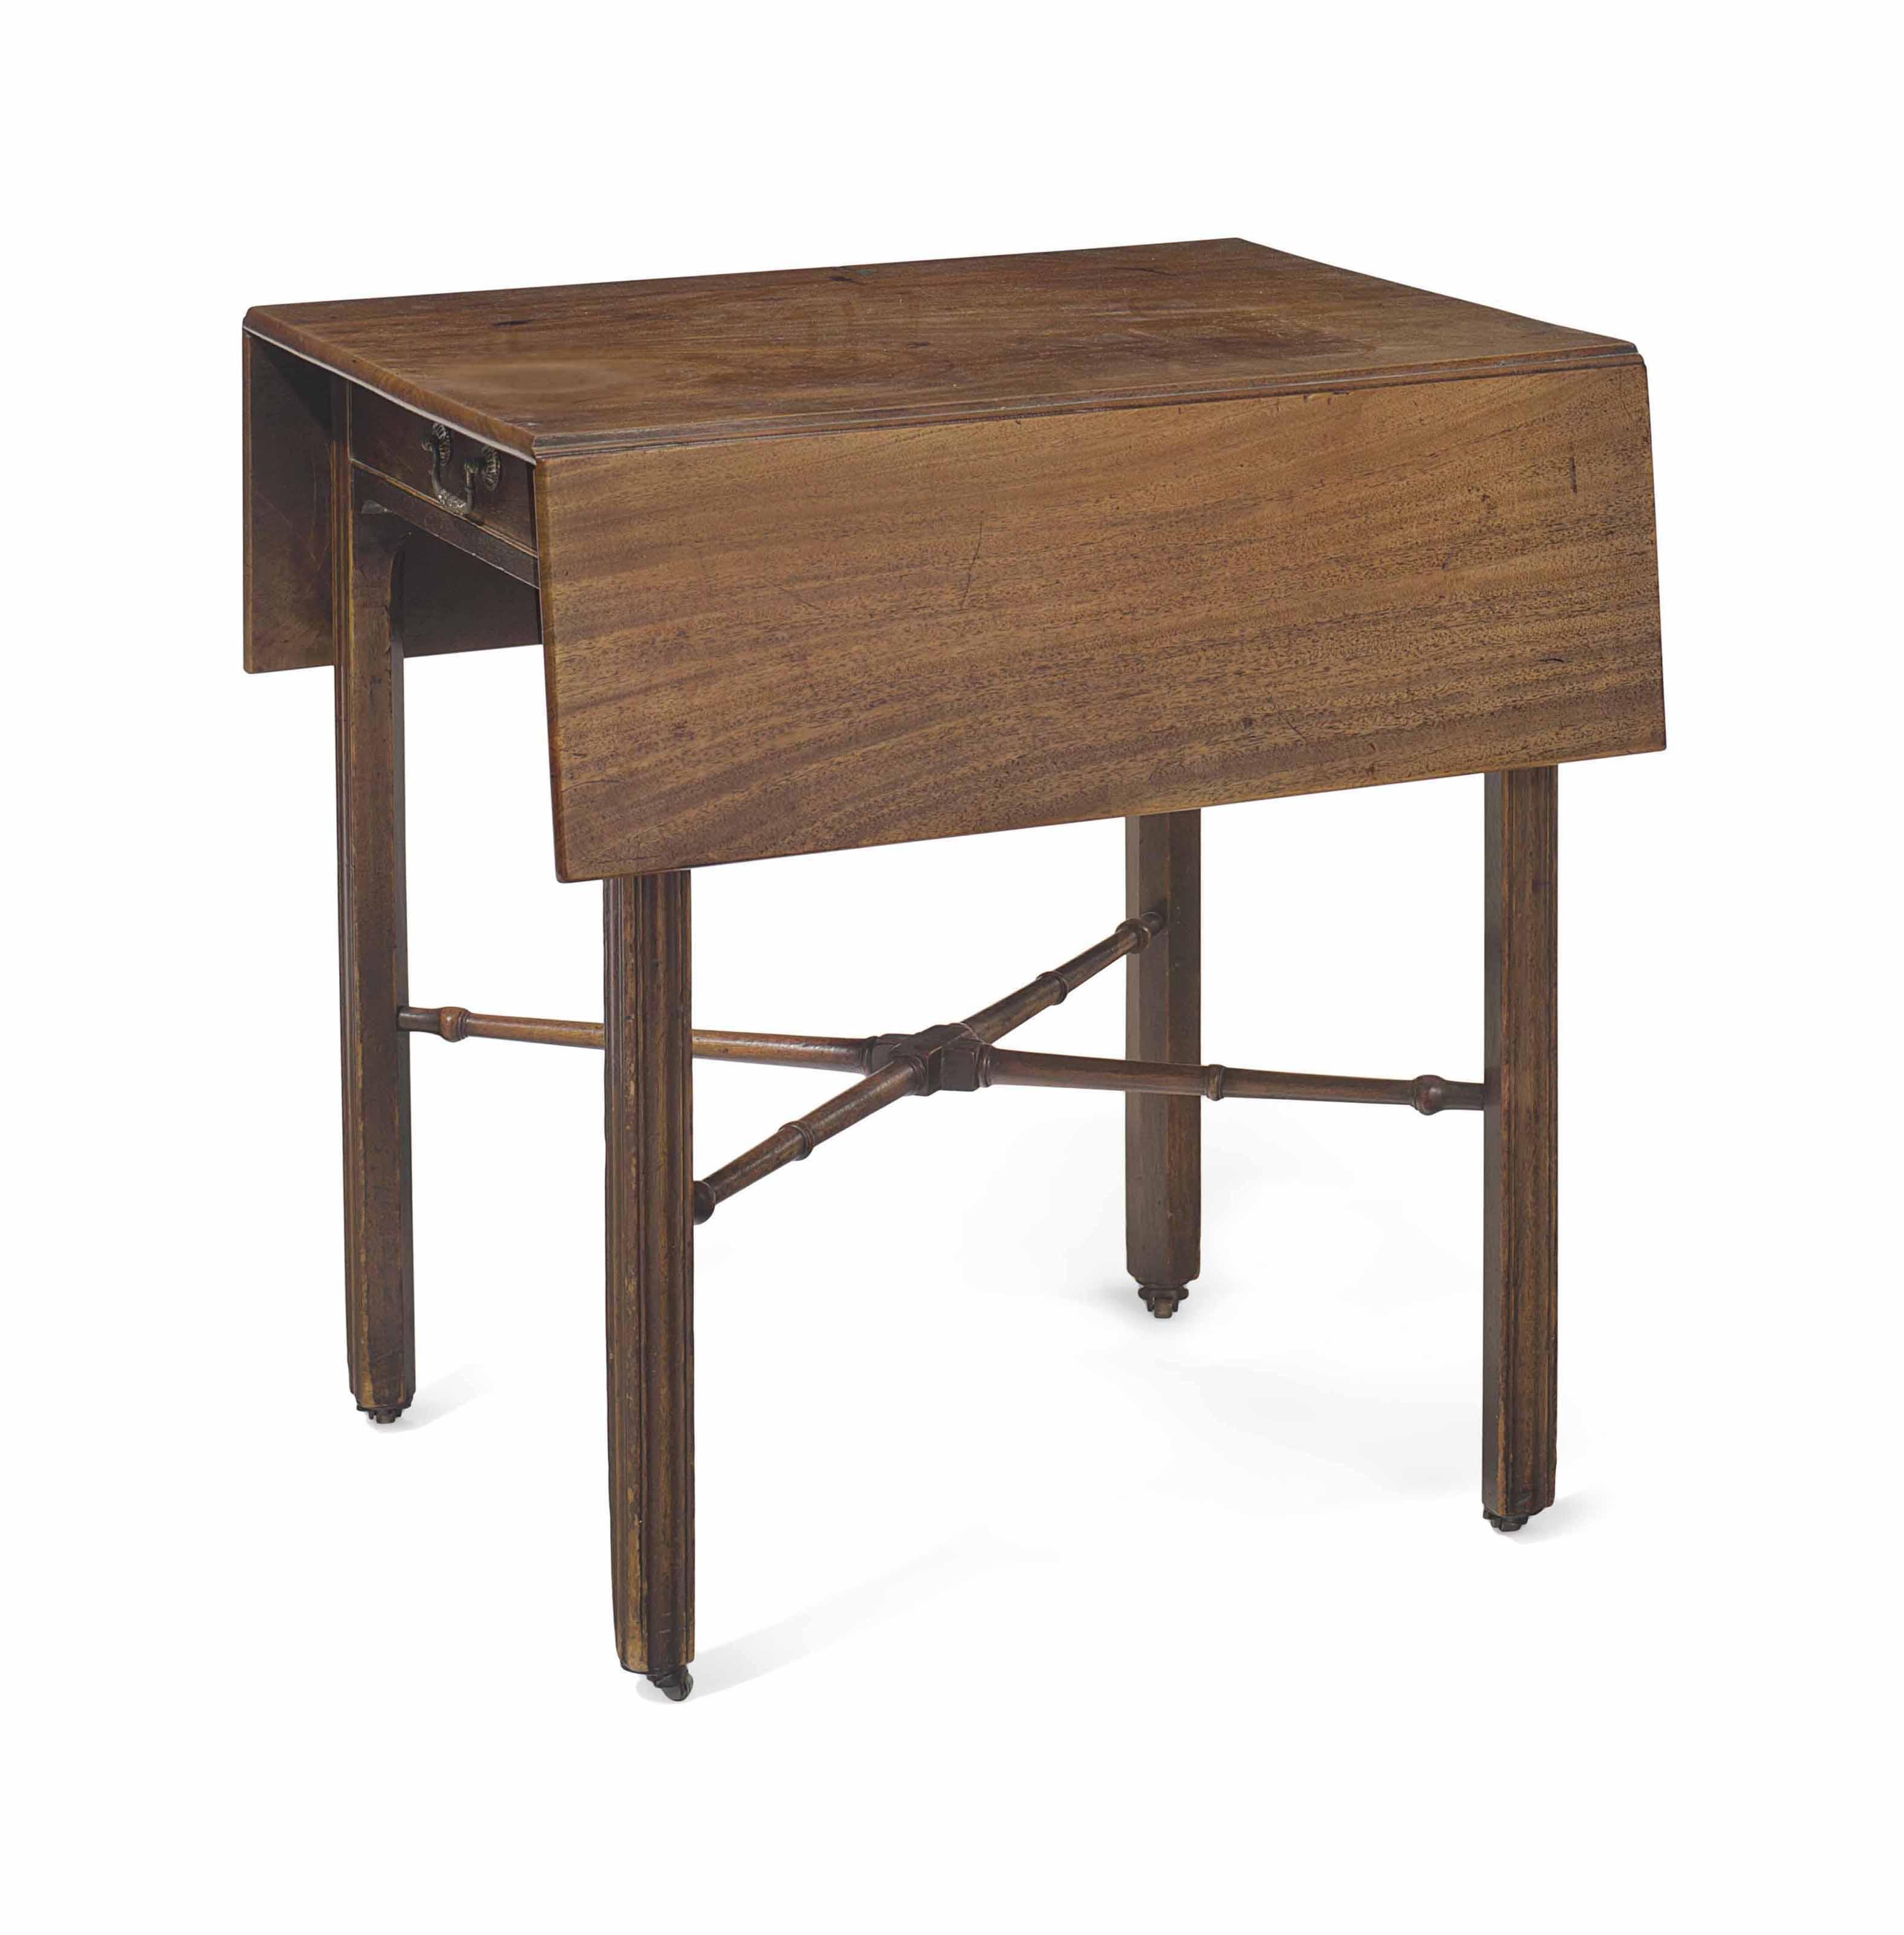 AN EARLY GEORGE III MAHOGANY PEMBROKE TABLE